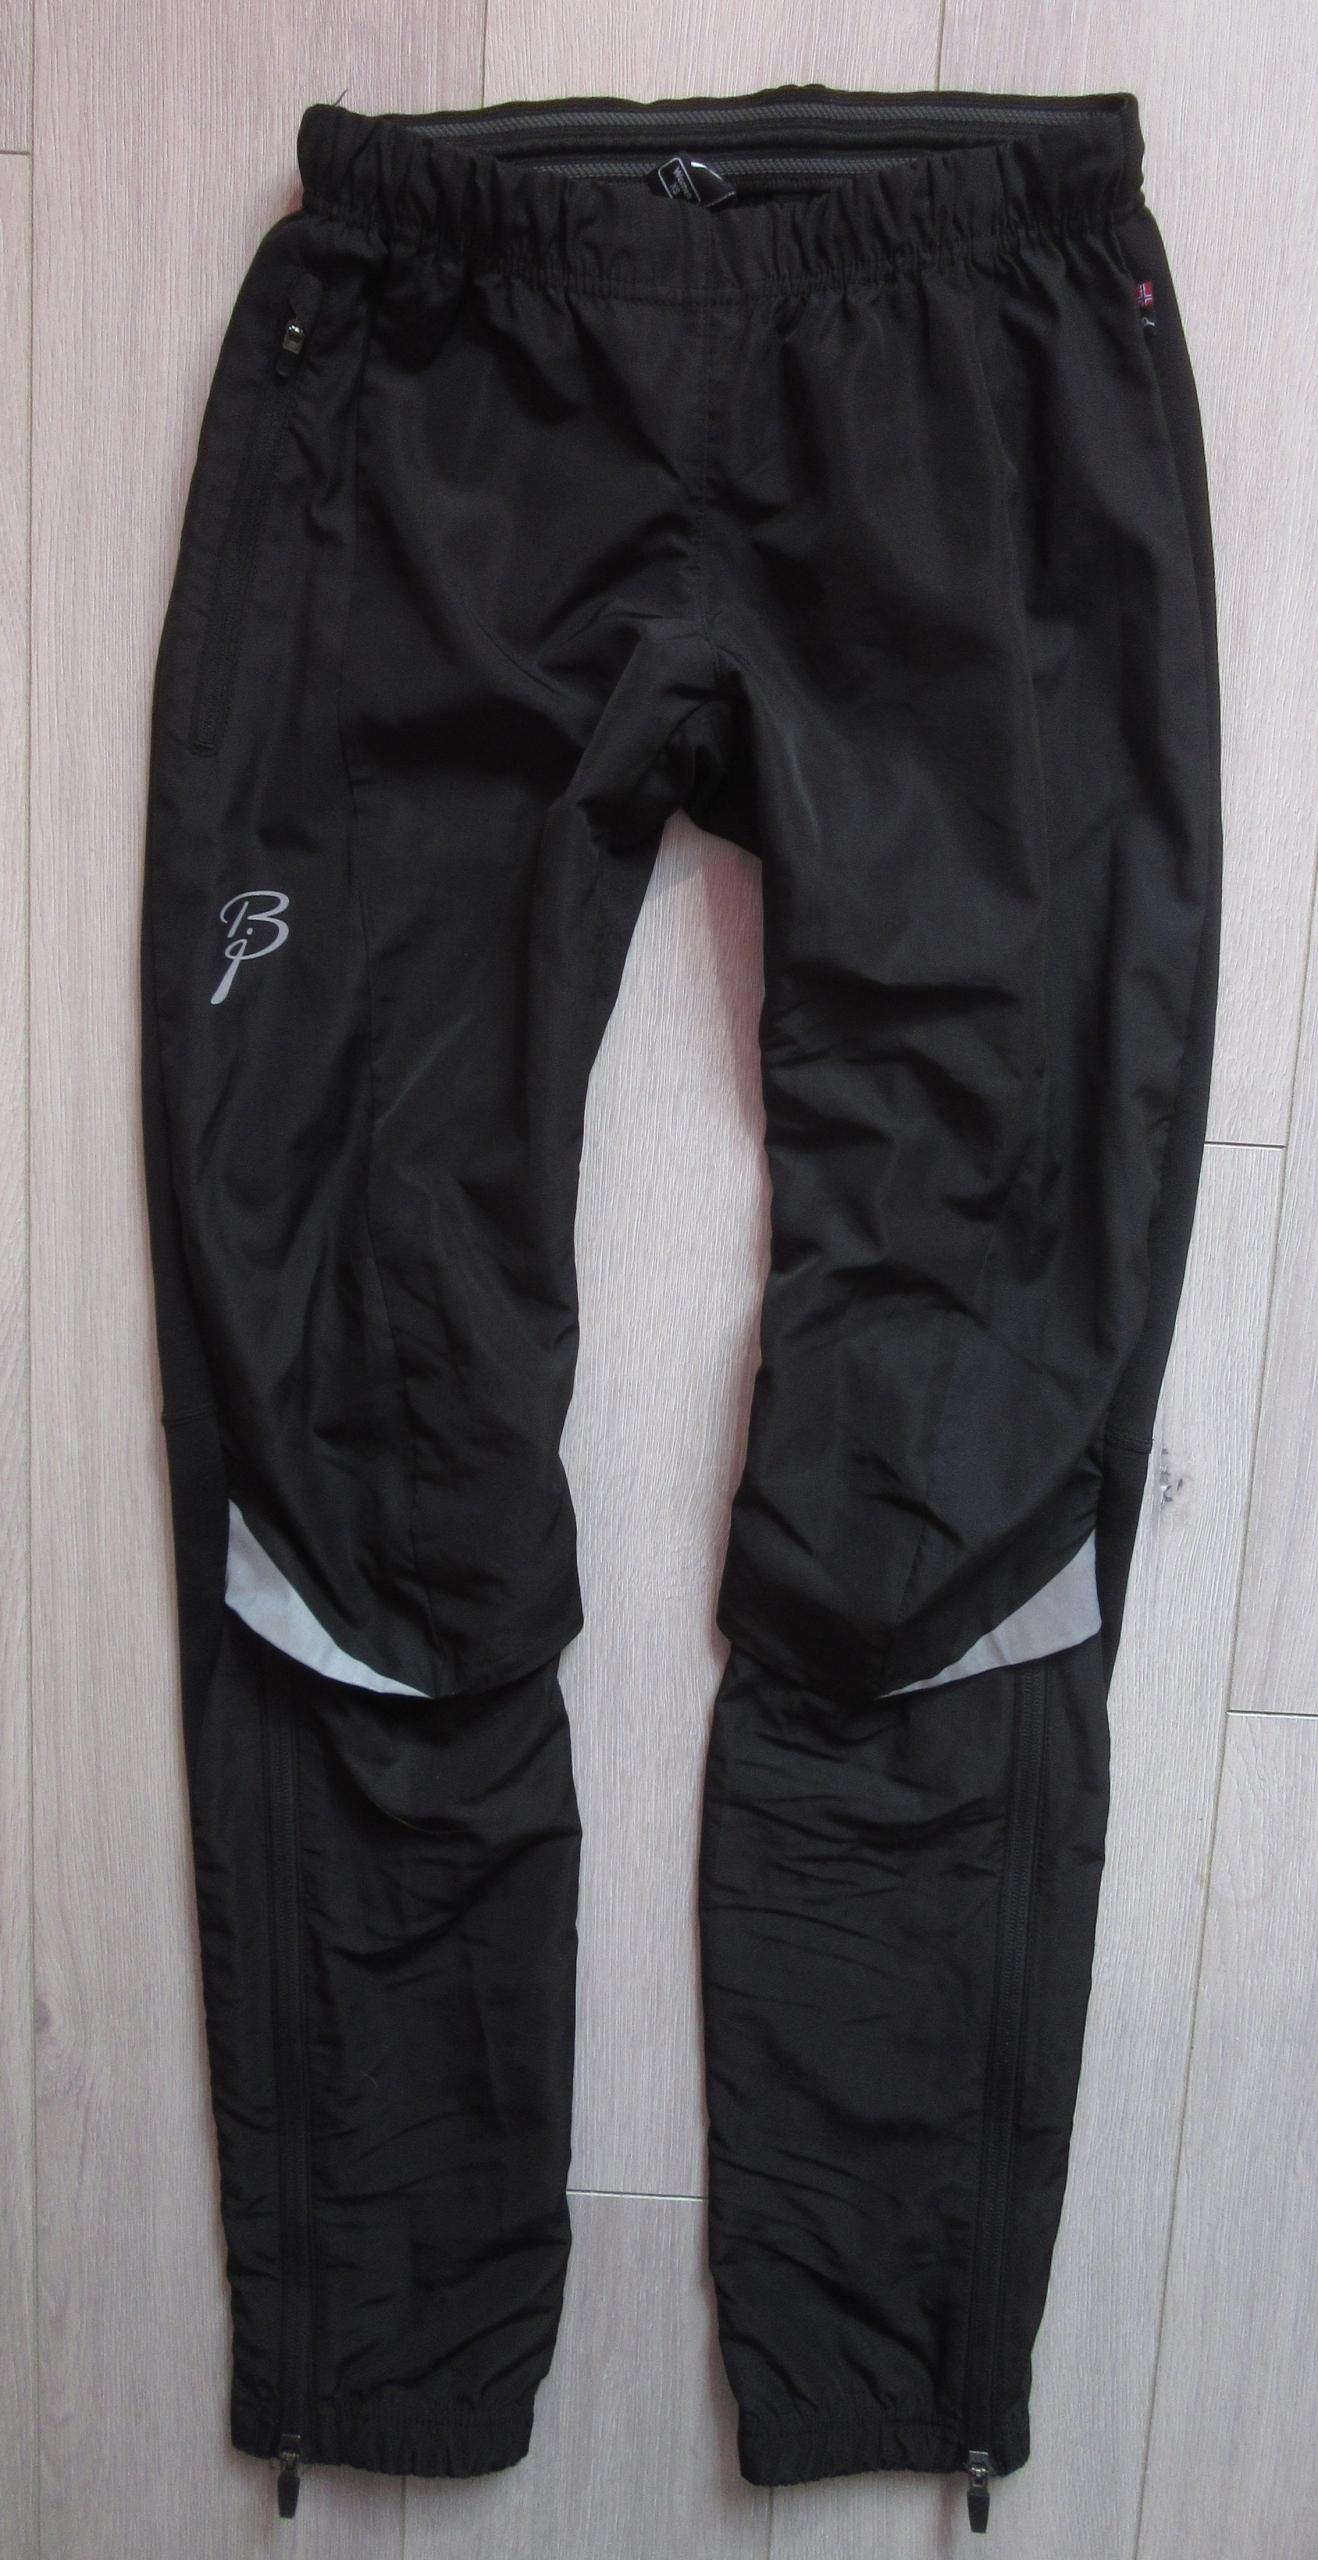 Damskie spodnie do biegania Bjorn Daehlie roz.XS